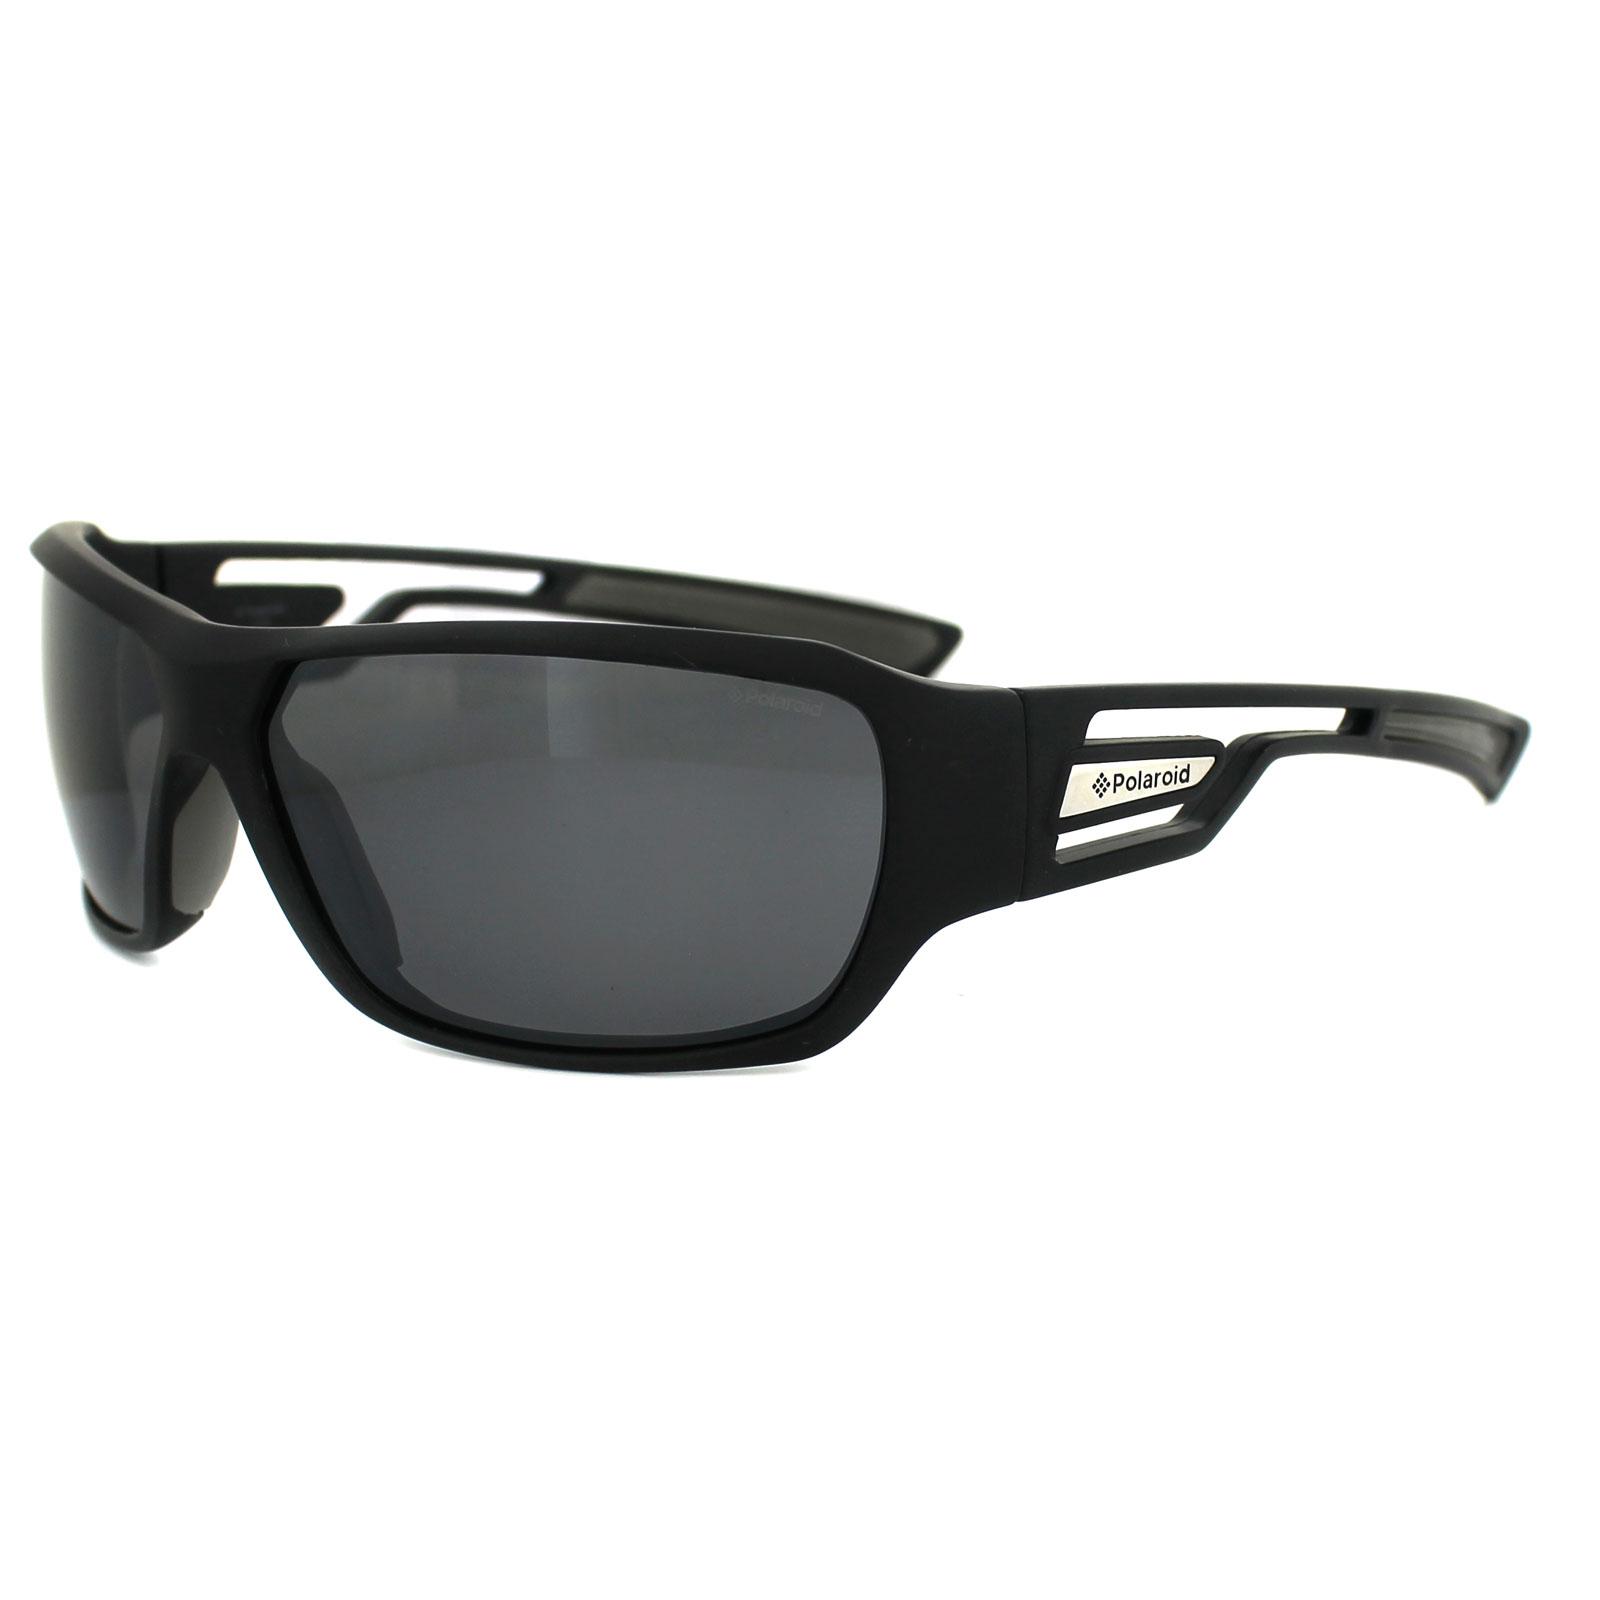 cc56067cd6 Dockers Polarized Oval Wrap Sunglasses